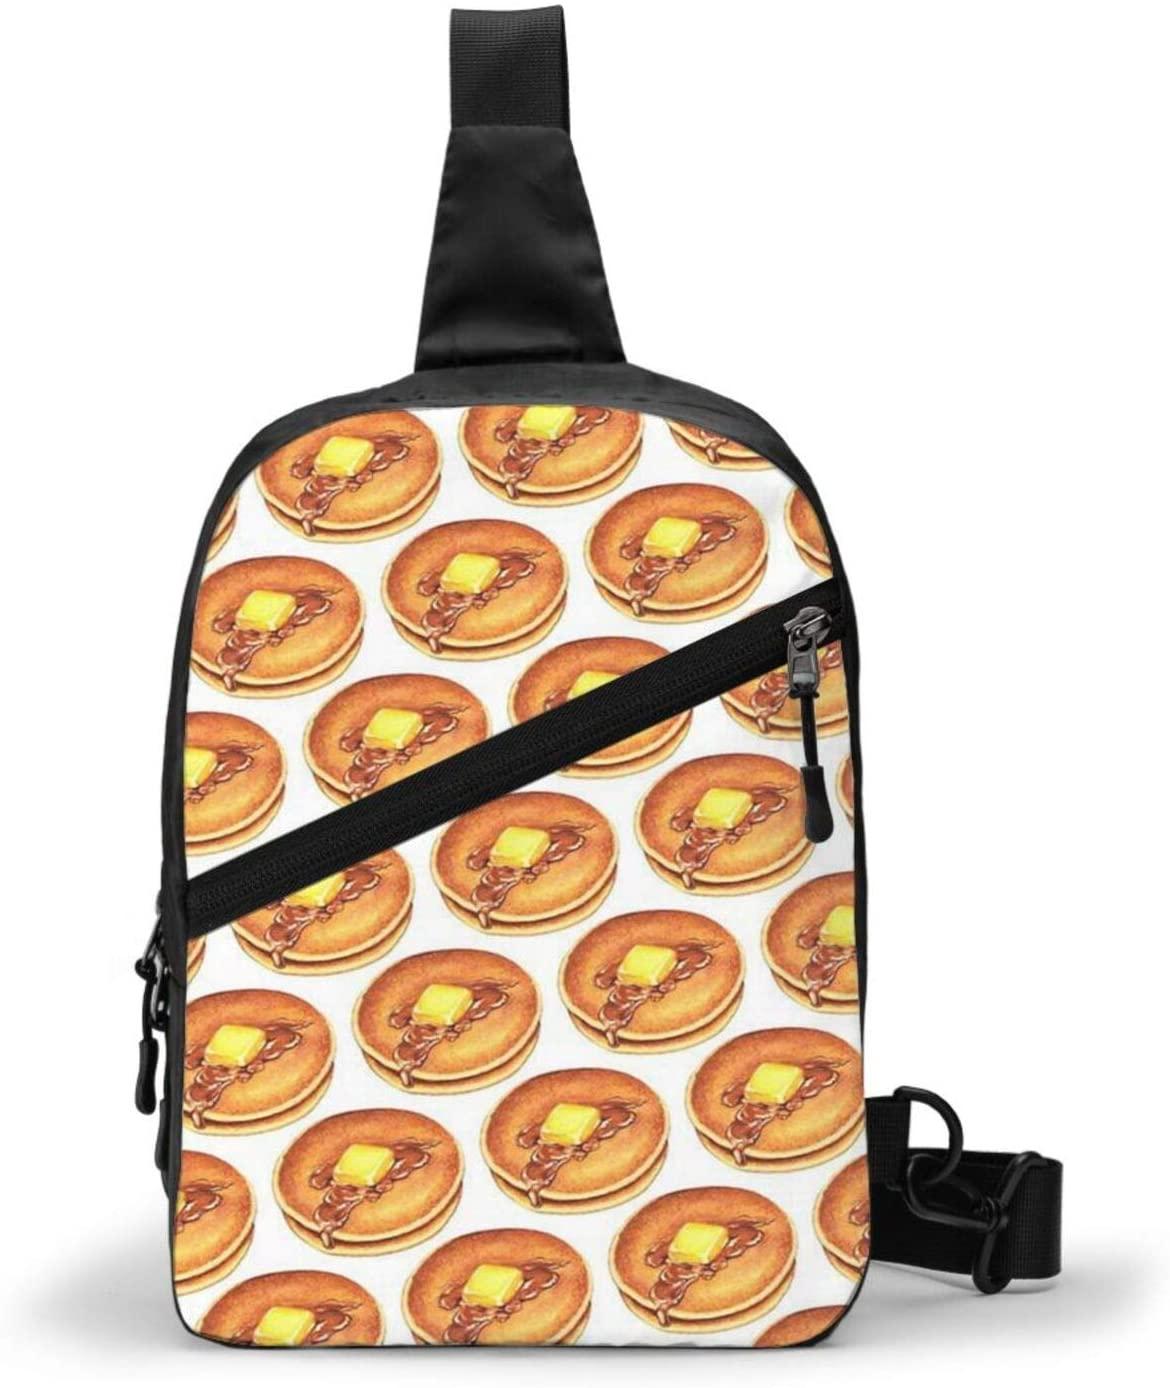 Neddelo Pancake Crossbody Bag,Portable Chest Bags,Folding Chest Bag, Men's and Women Sling Bag for Travel,Hiking, Cycling,Camping